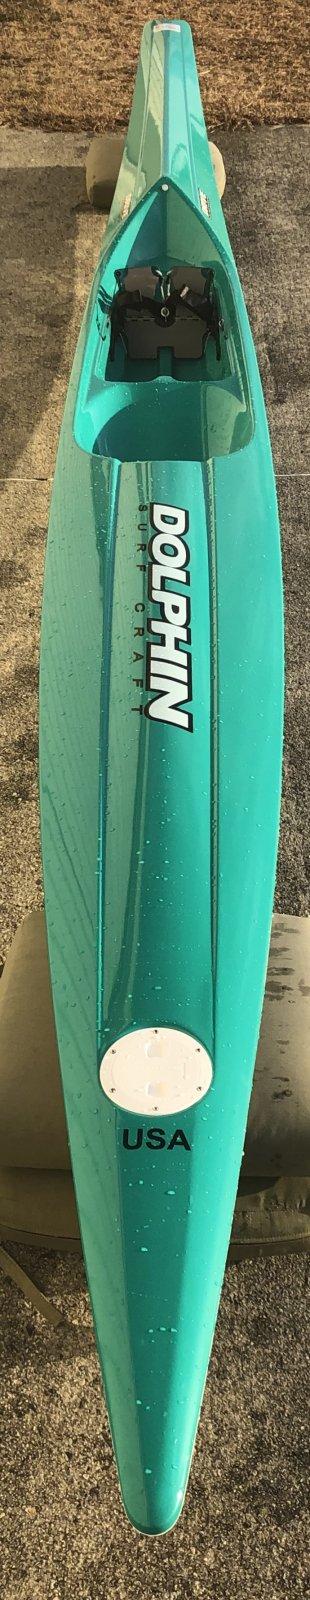 Dolphin Adjustable Drive II Surf Ski 19' - 1038